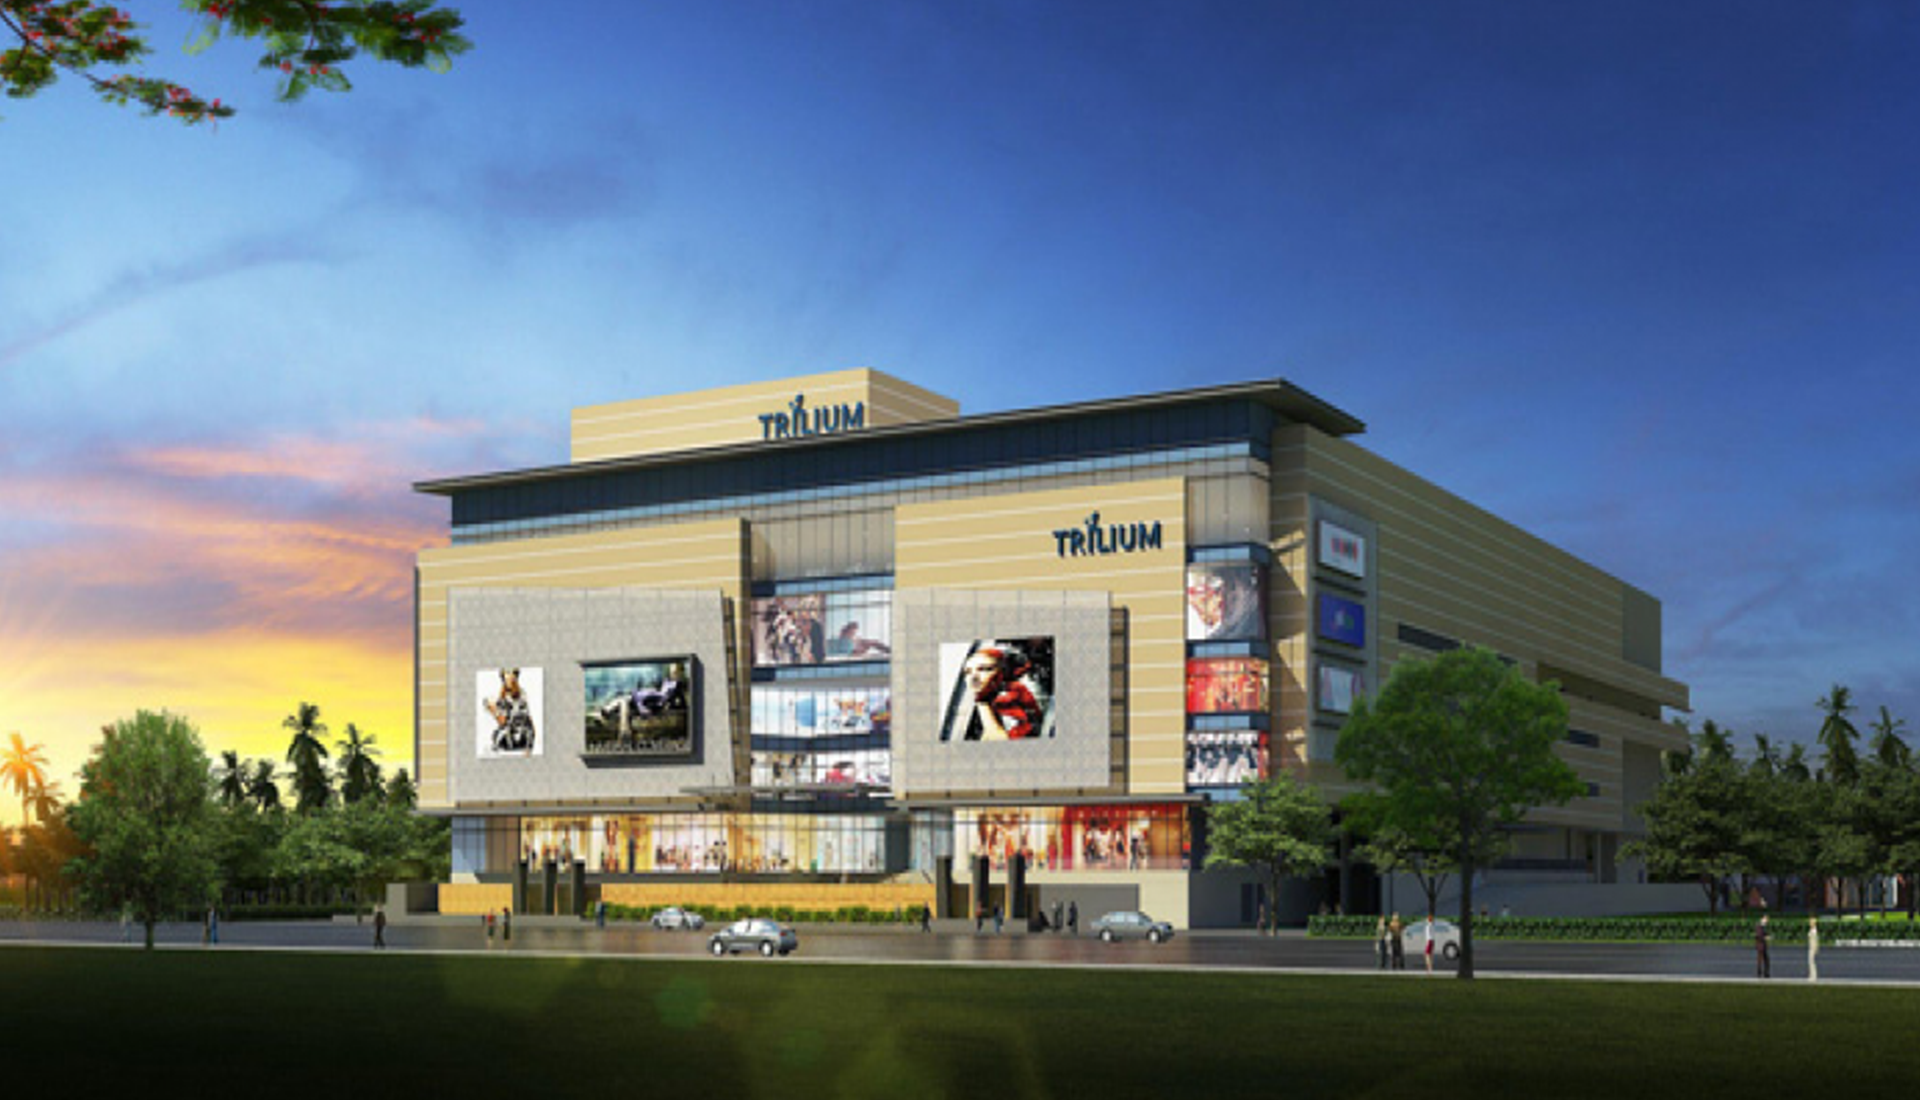 Trillium Mall, Nagpur